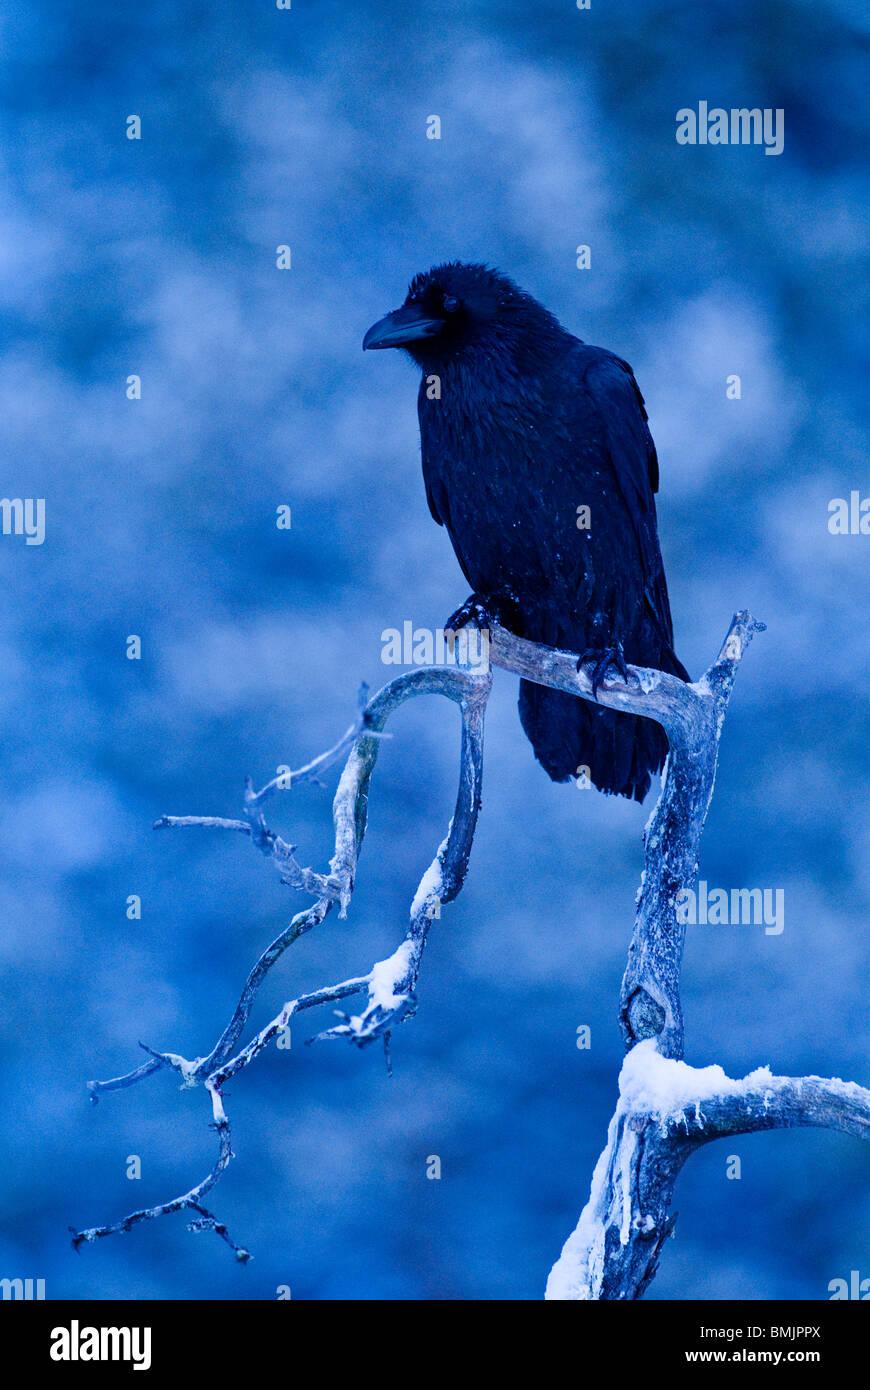 Scandinavia, Sweden, Vasterbotten, Raven crow perching on tree, close-up - Stock Image